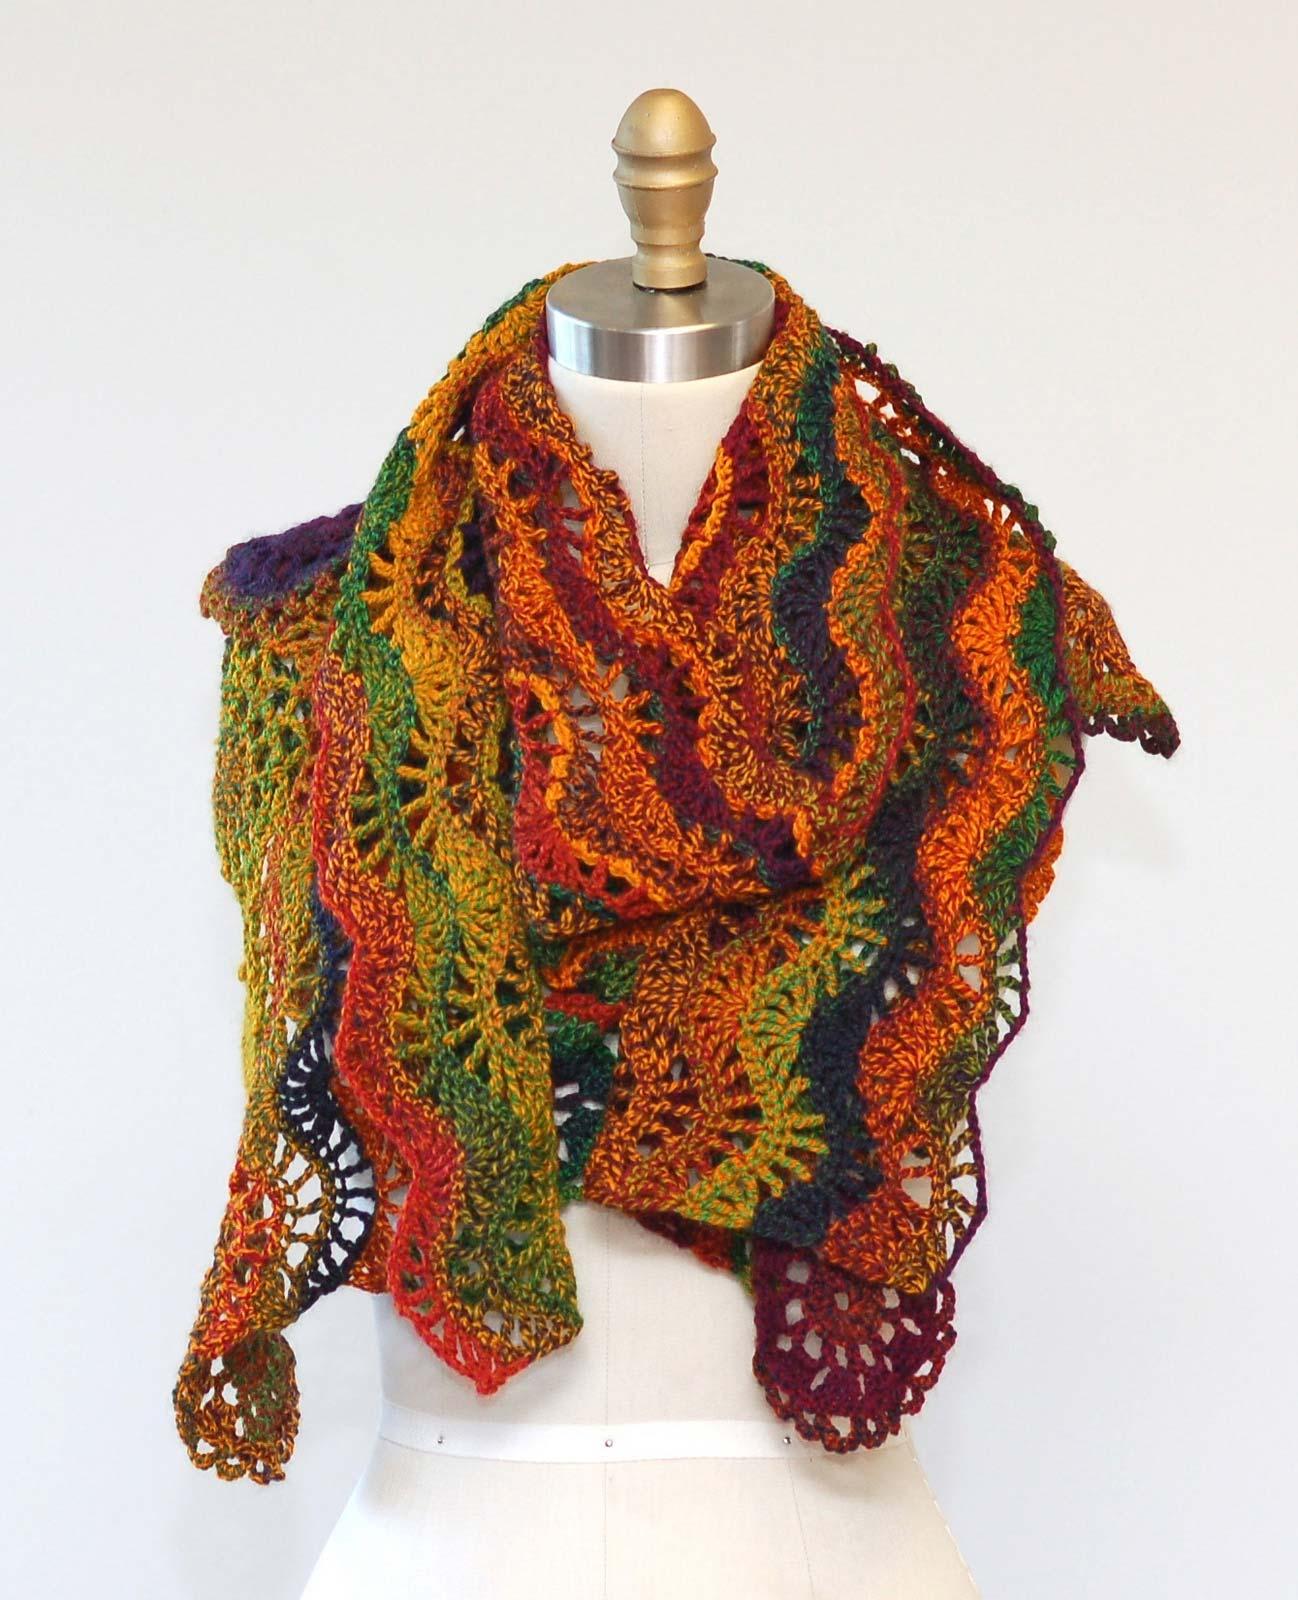 Scarf Crochet Pattern Ripple As You Go photo 2